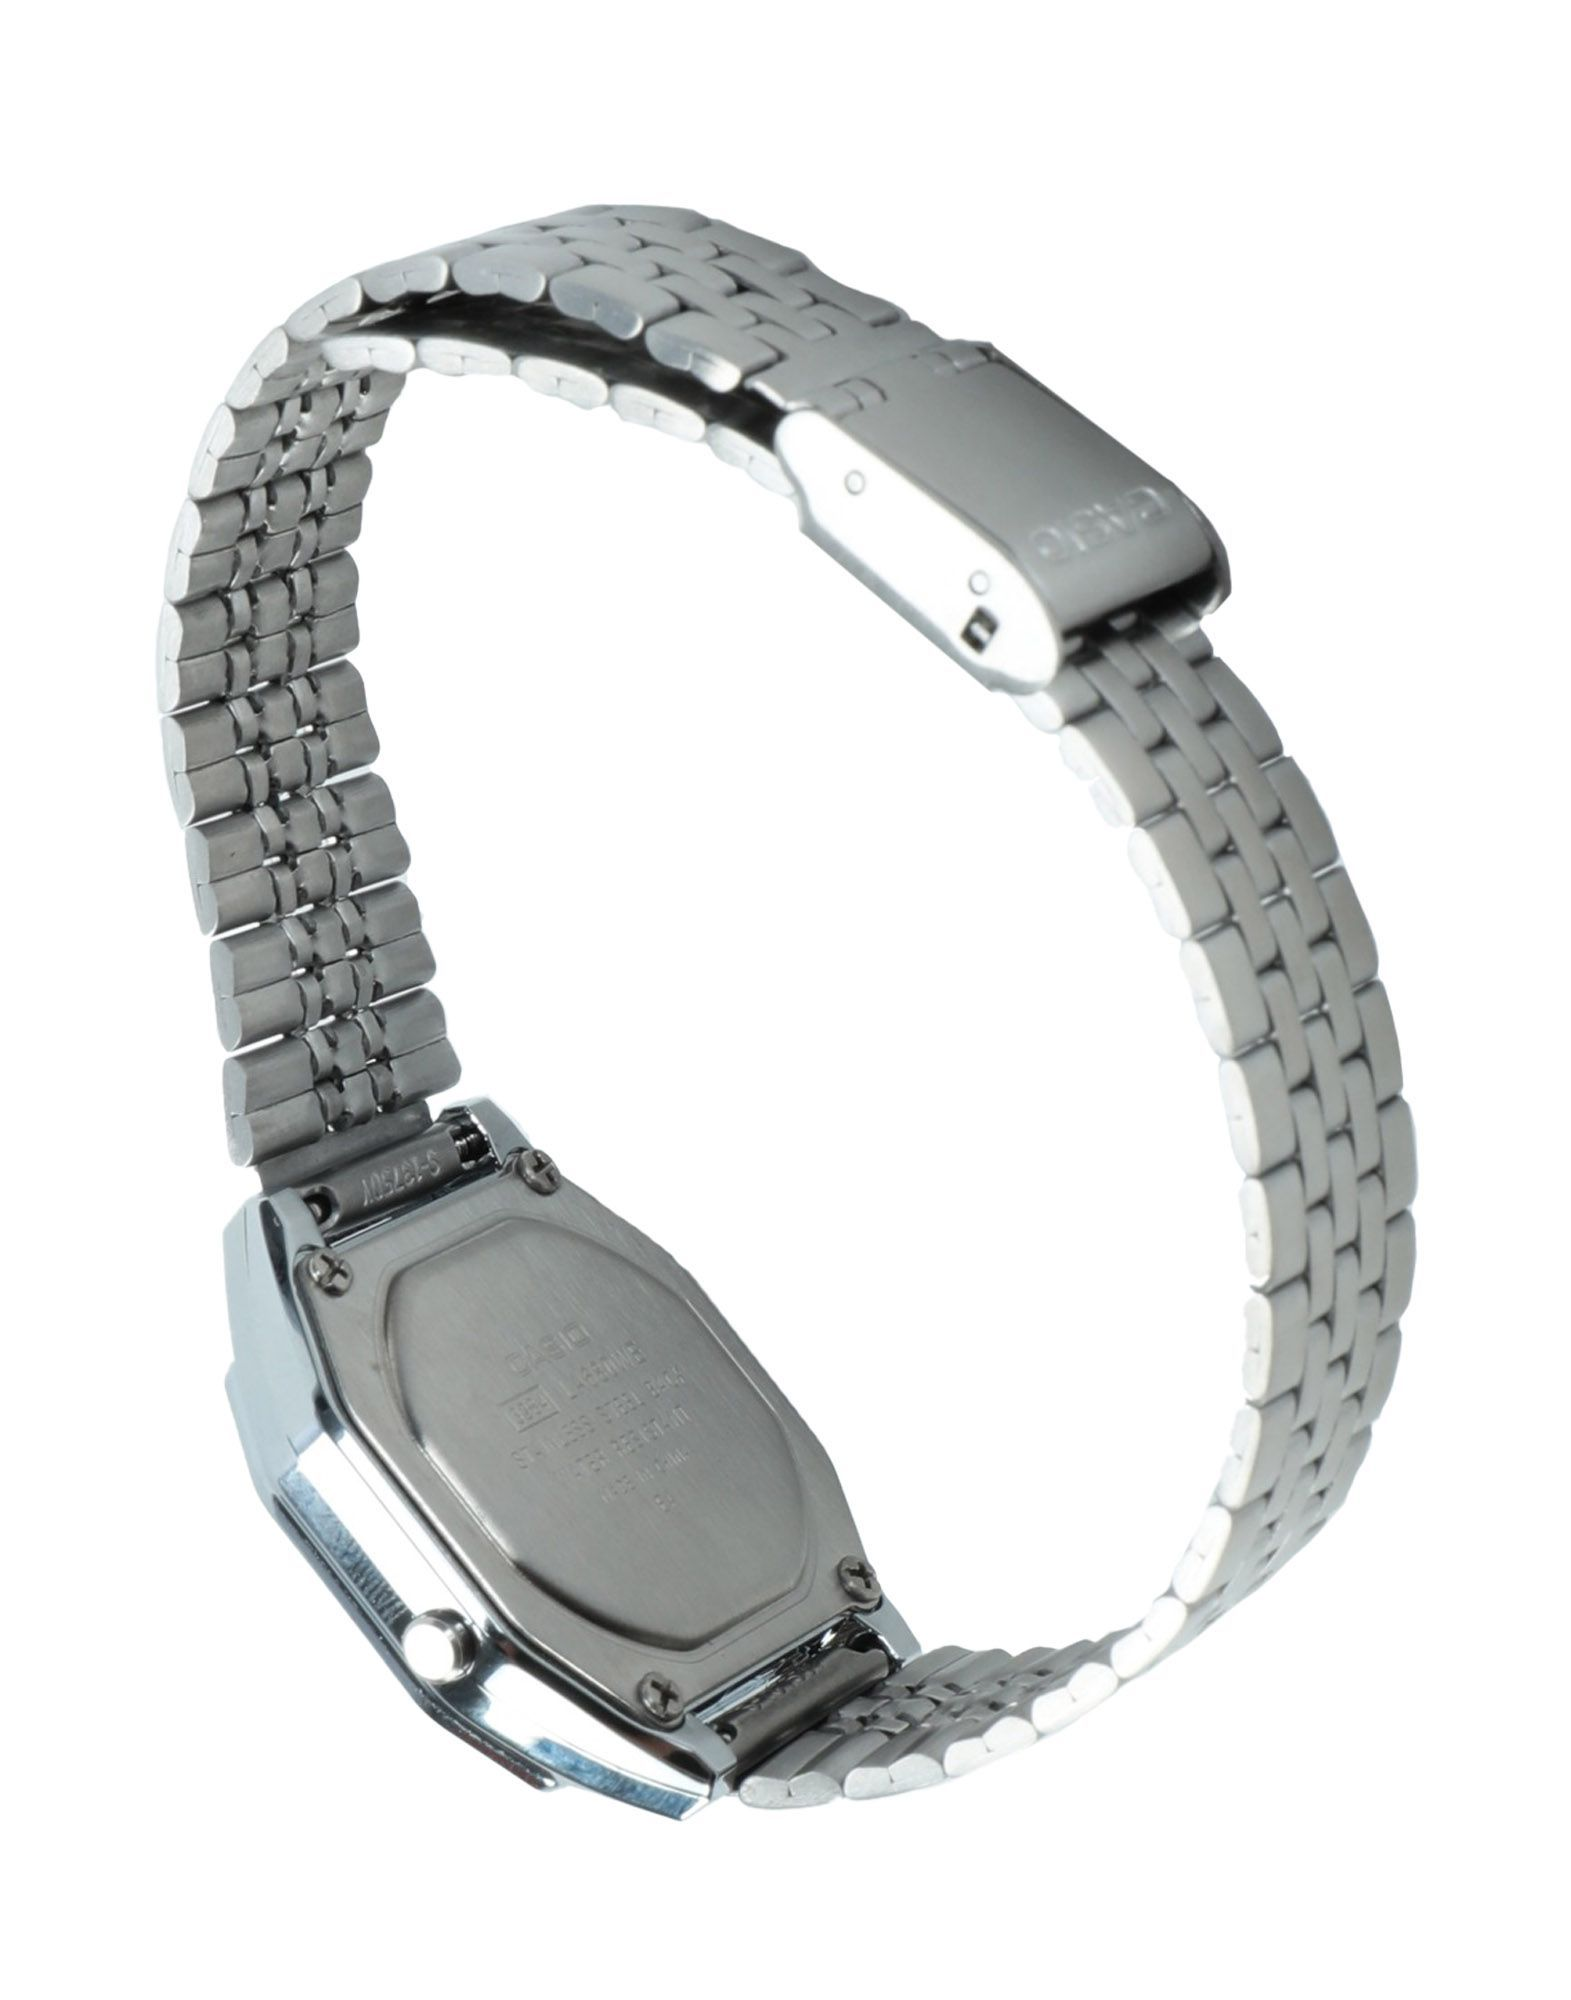 Casio Silver Stainless Steel Water Resistant Digital Watch